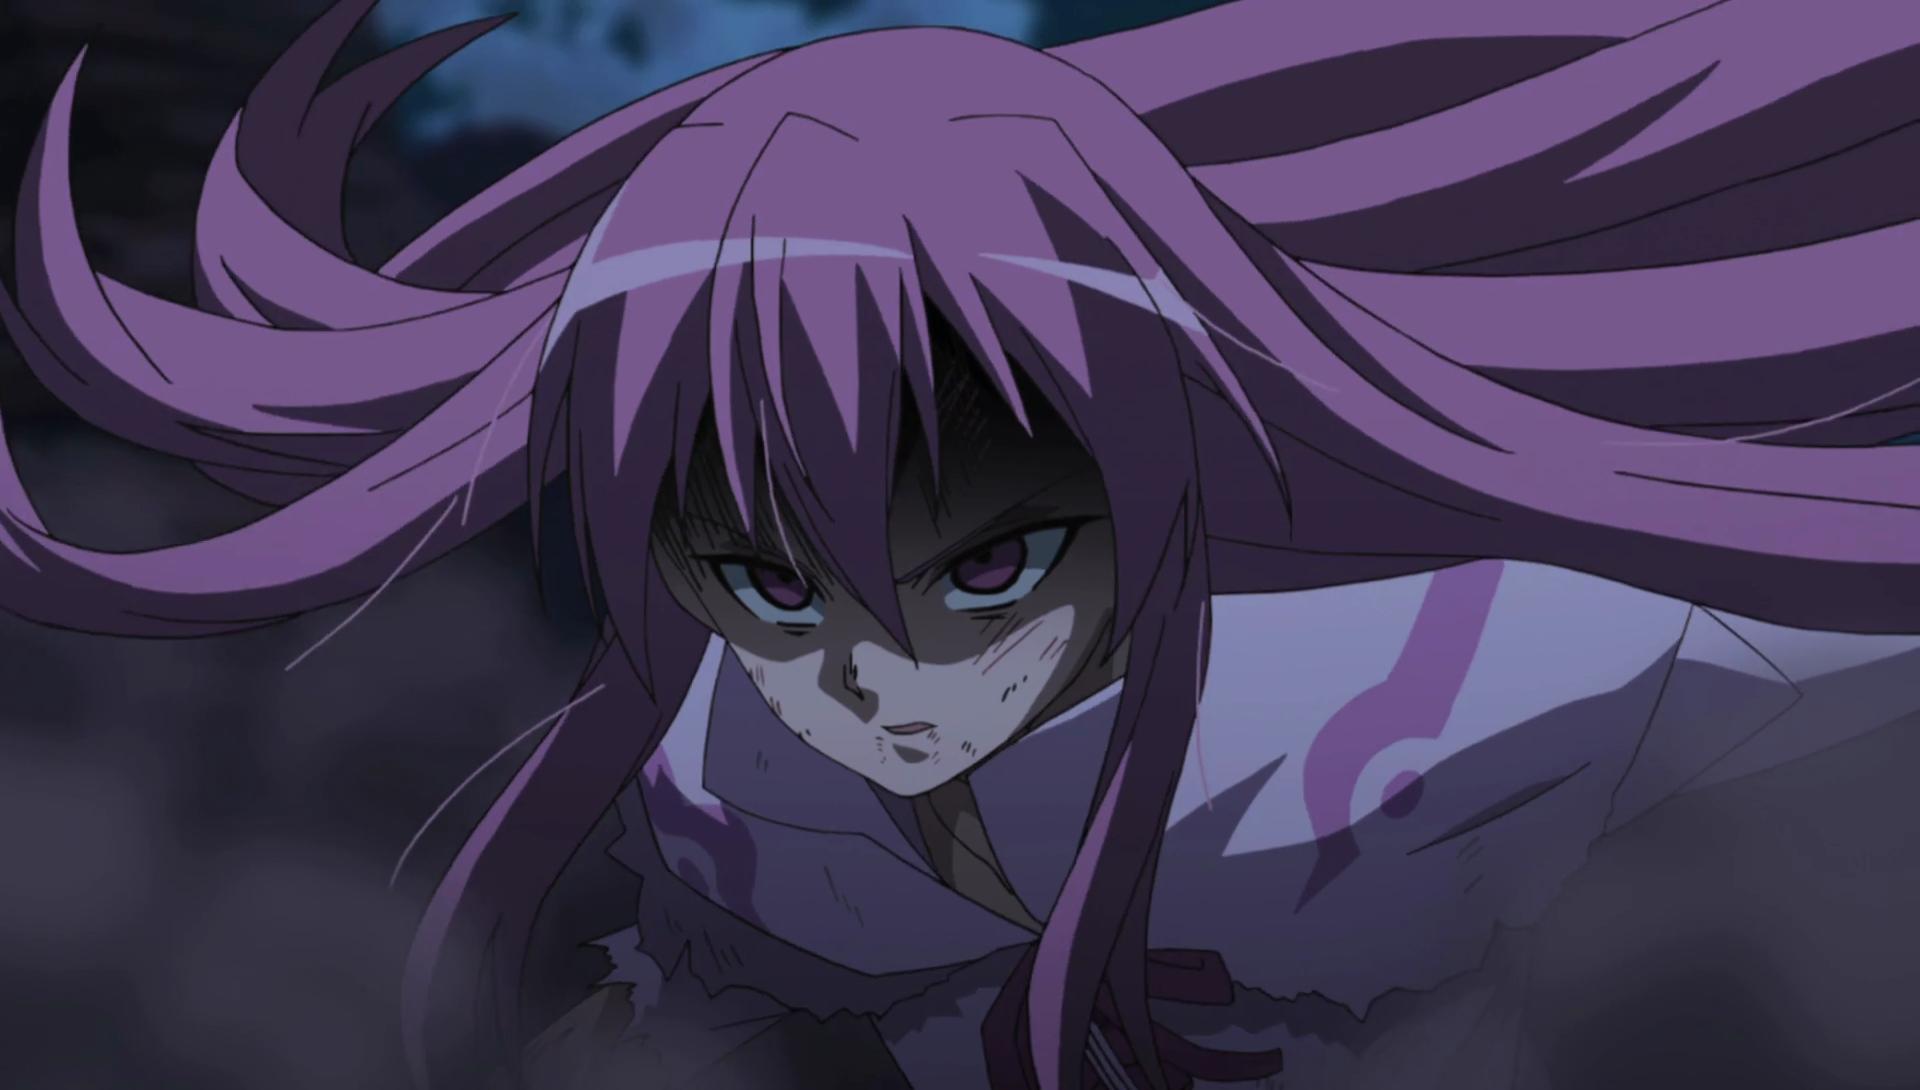 Wallpaper Akame Ga Kill Mine Pink Eyes Pink Hair 1920x1090